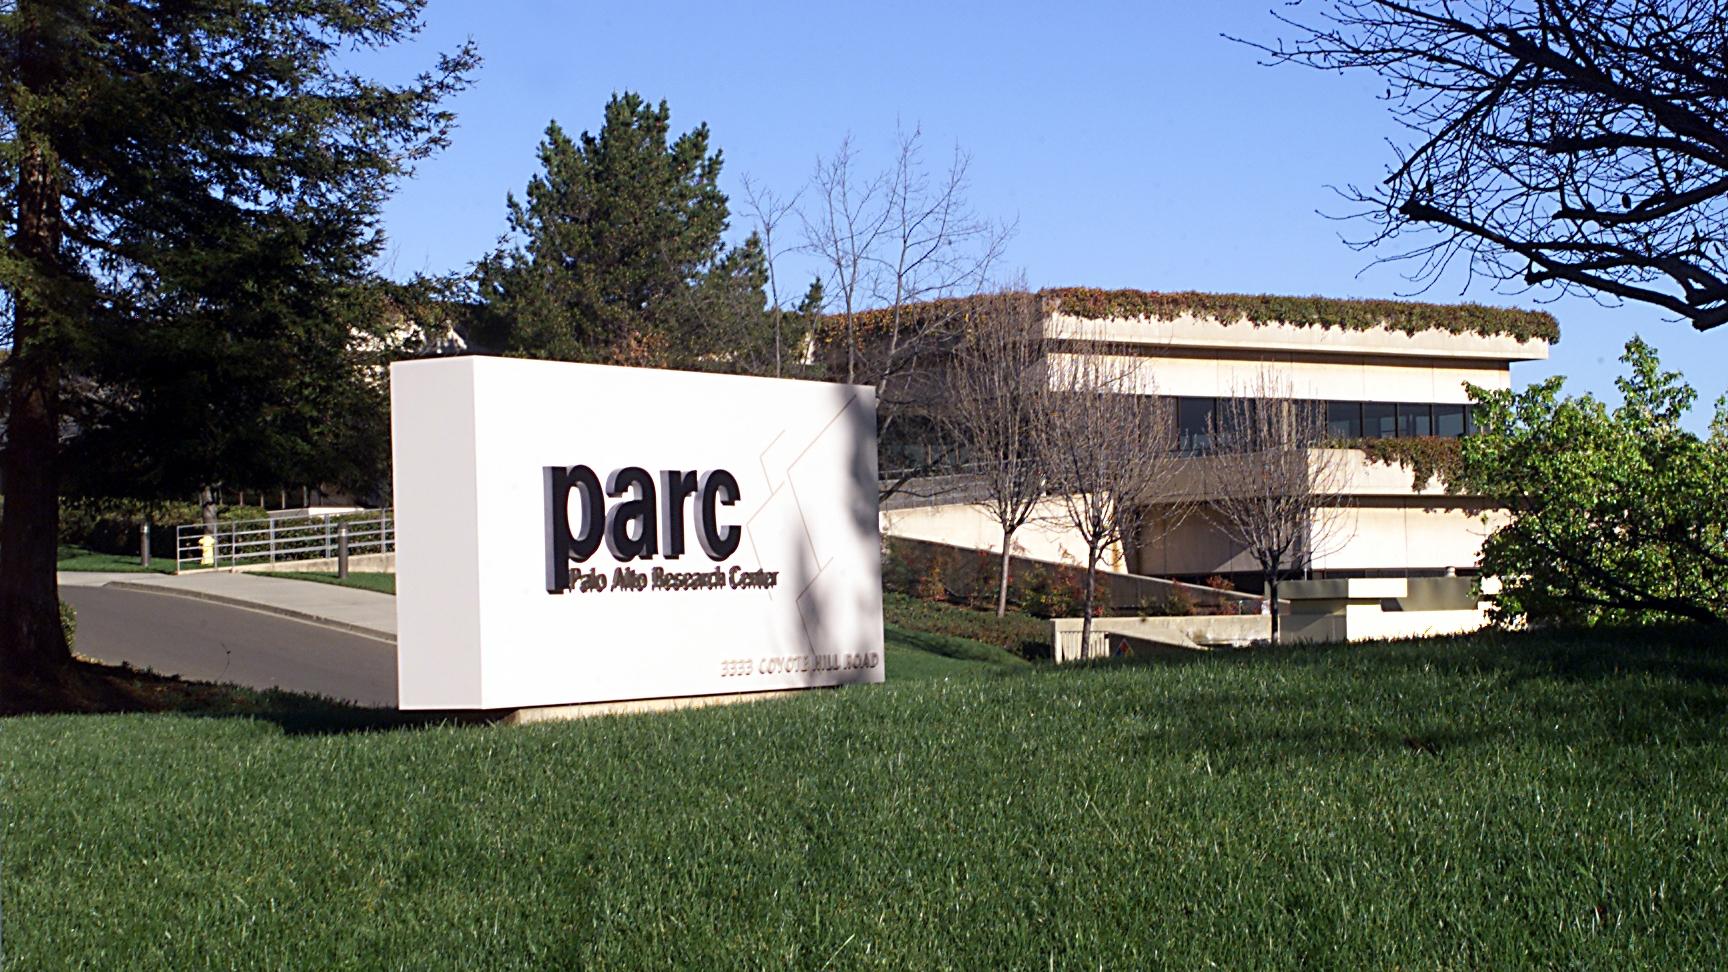 39052-Palo_Alto_Research_Center_(PARC)_Palo_Alto_Calif..jpg